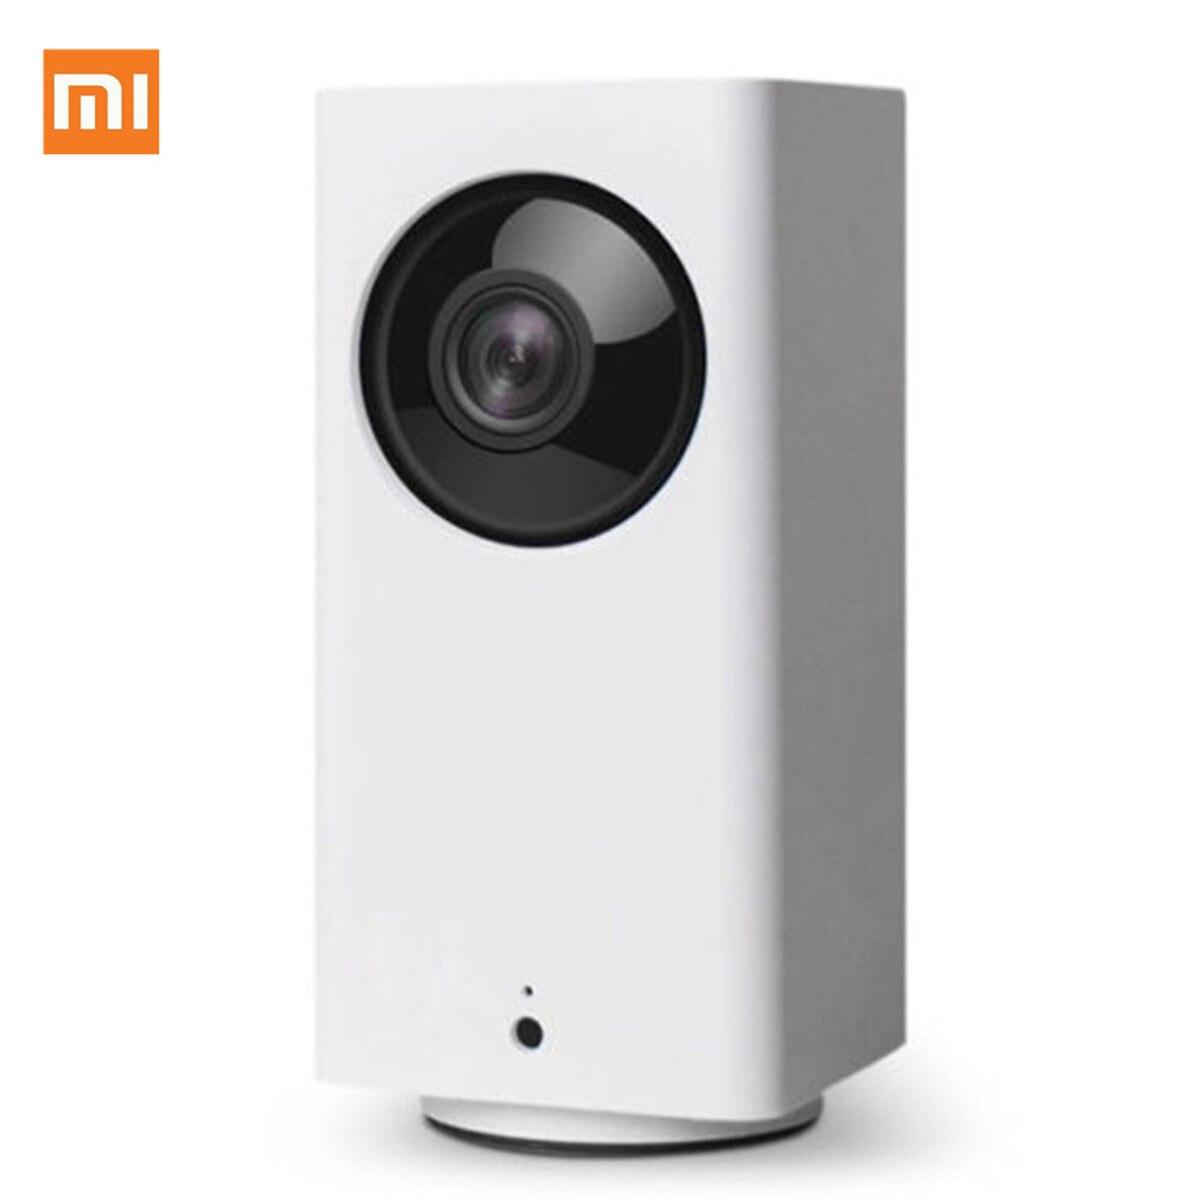 Xiaomi Mijia YOUPIN DAFANG 1080p caméra IP intelligente caméra intelligente HD intelligente WIFI Vision nocturne caméra vidéo de bureau à domicile